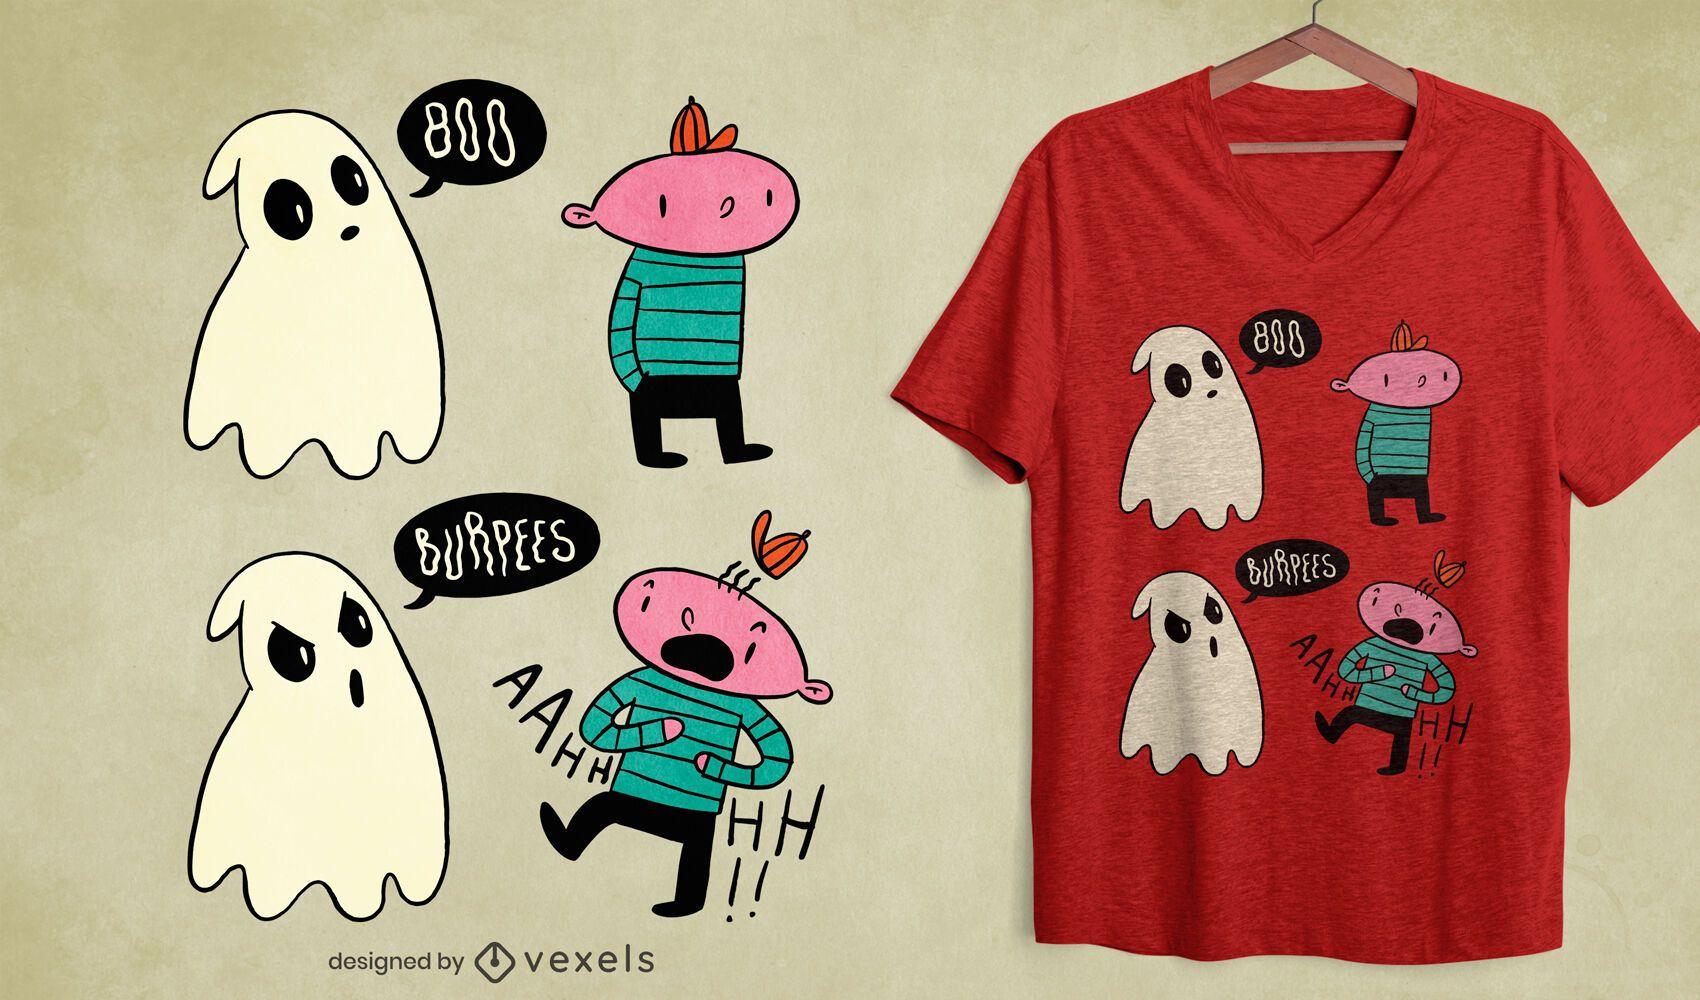 Diseño de camiseta boo burpees